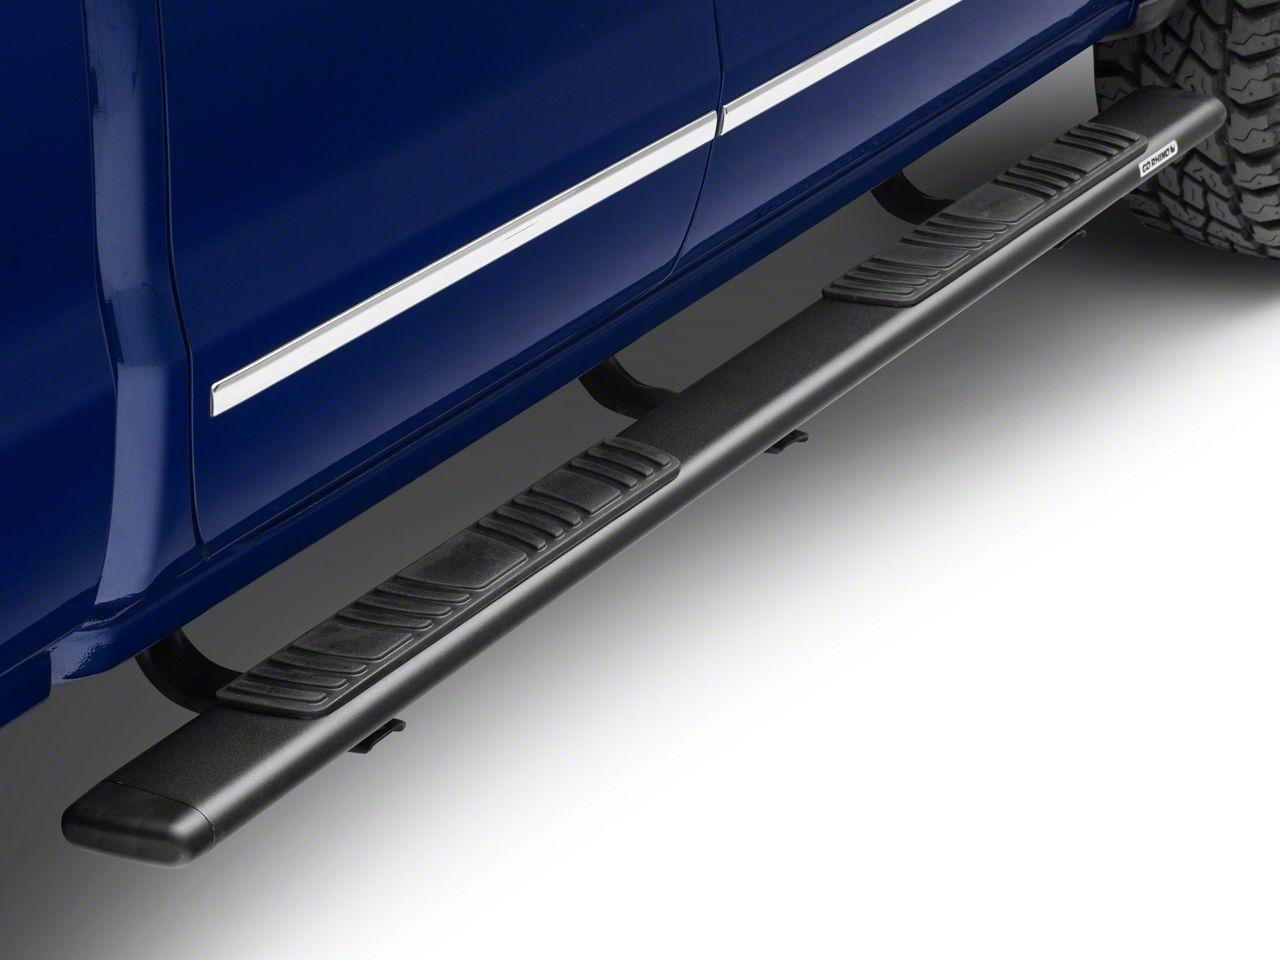 Go Rhino 5 in. OE Xtreme Low Profile Side Step Bars - Textured Black (14-18 Silverado 1500 Double Cab)